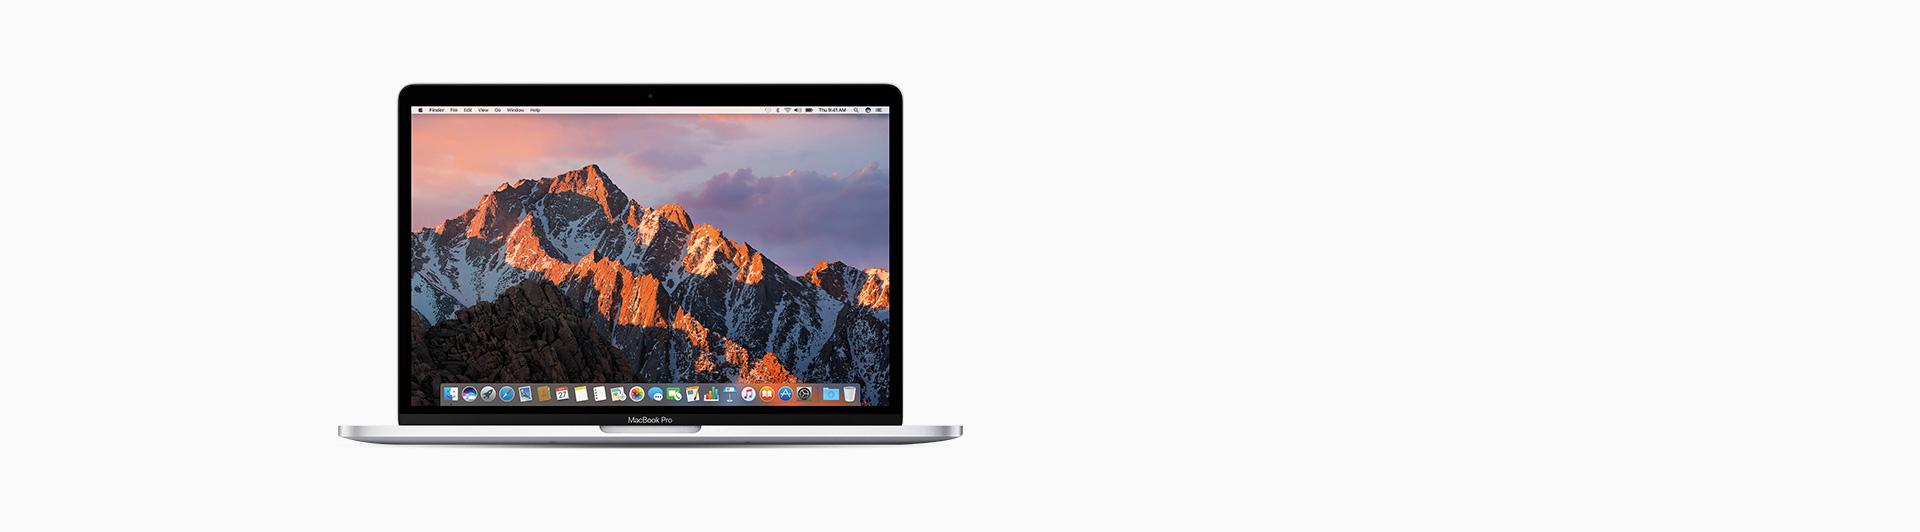 Macbook Pro 13 Inch 256GB (2017) cao cấp tại Nguyễn Kim